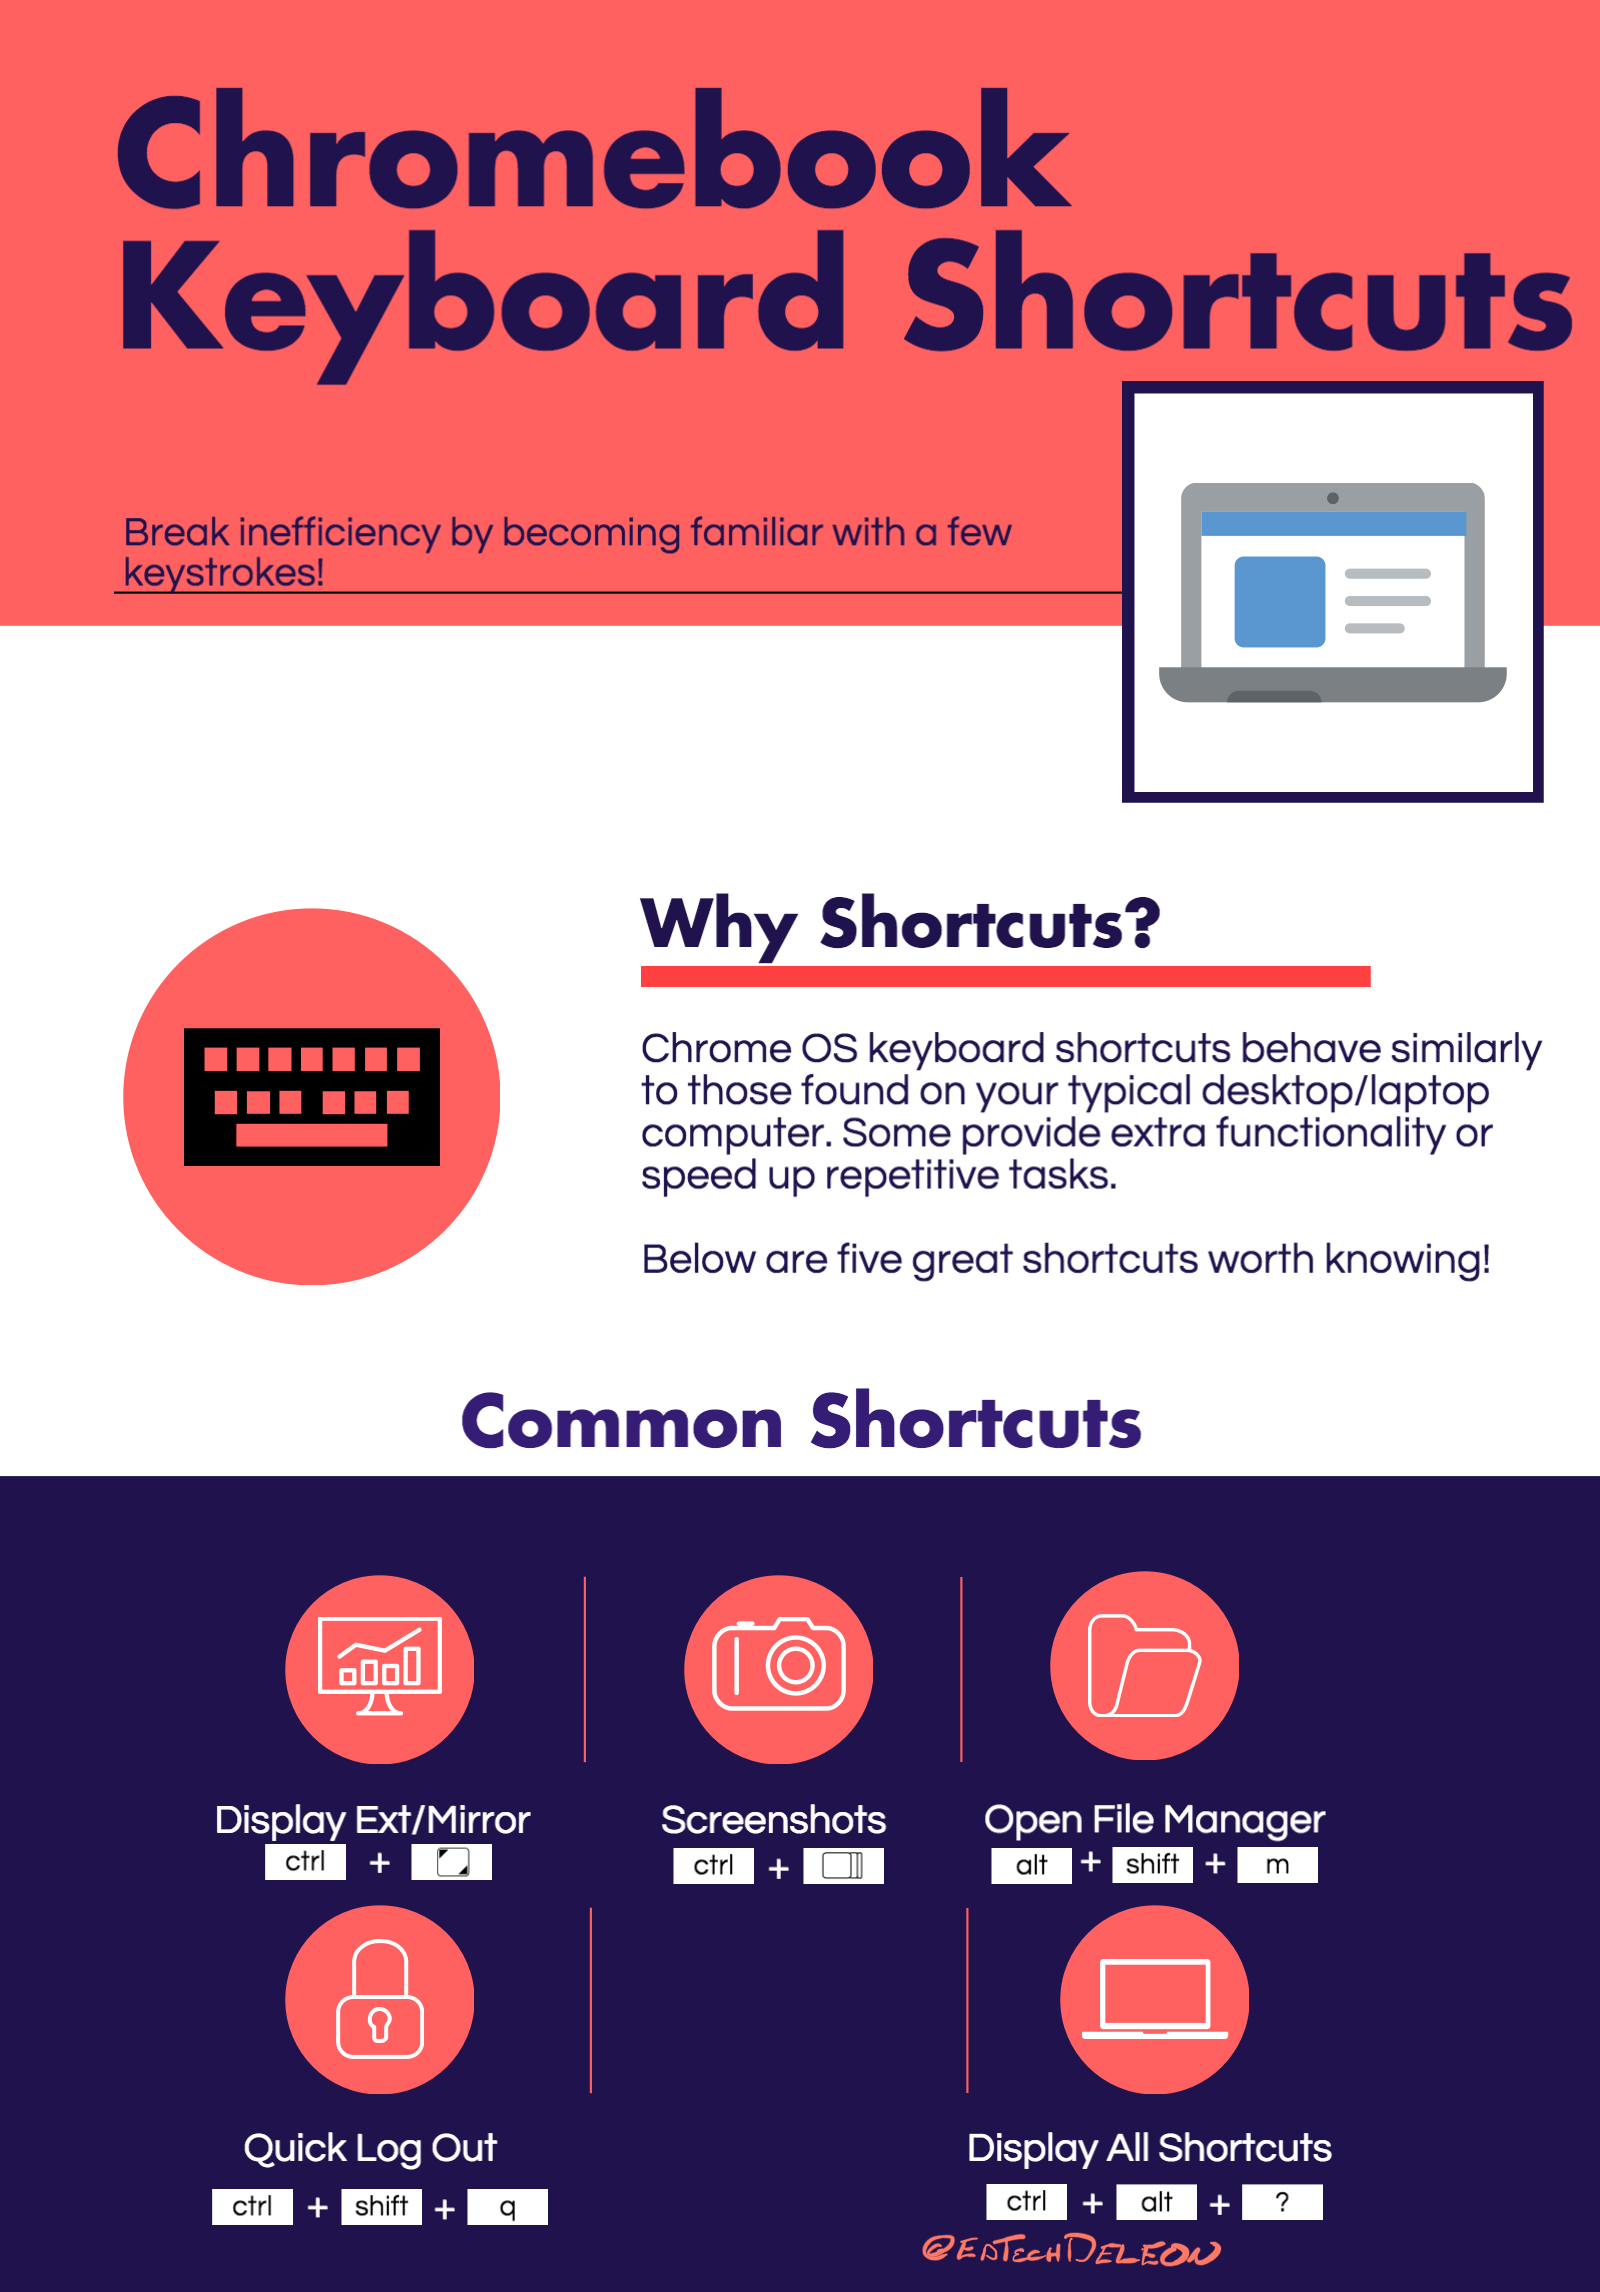 Chromebook Keyboard Shortcuts Guide